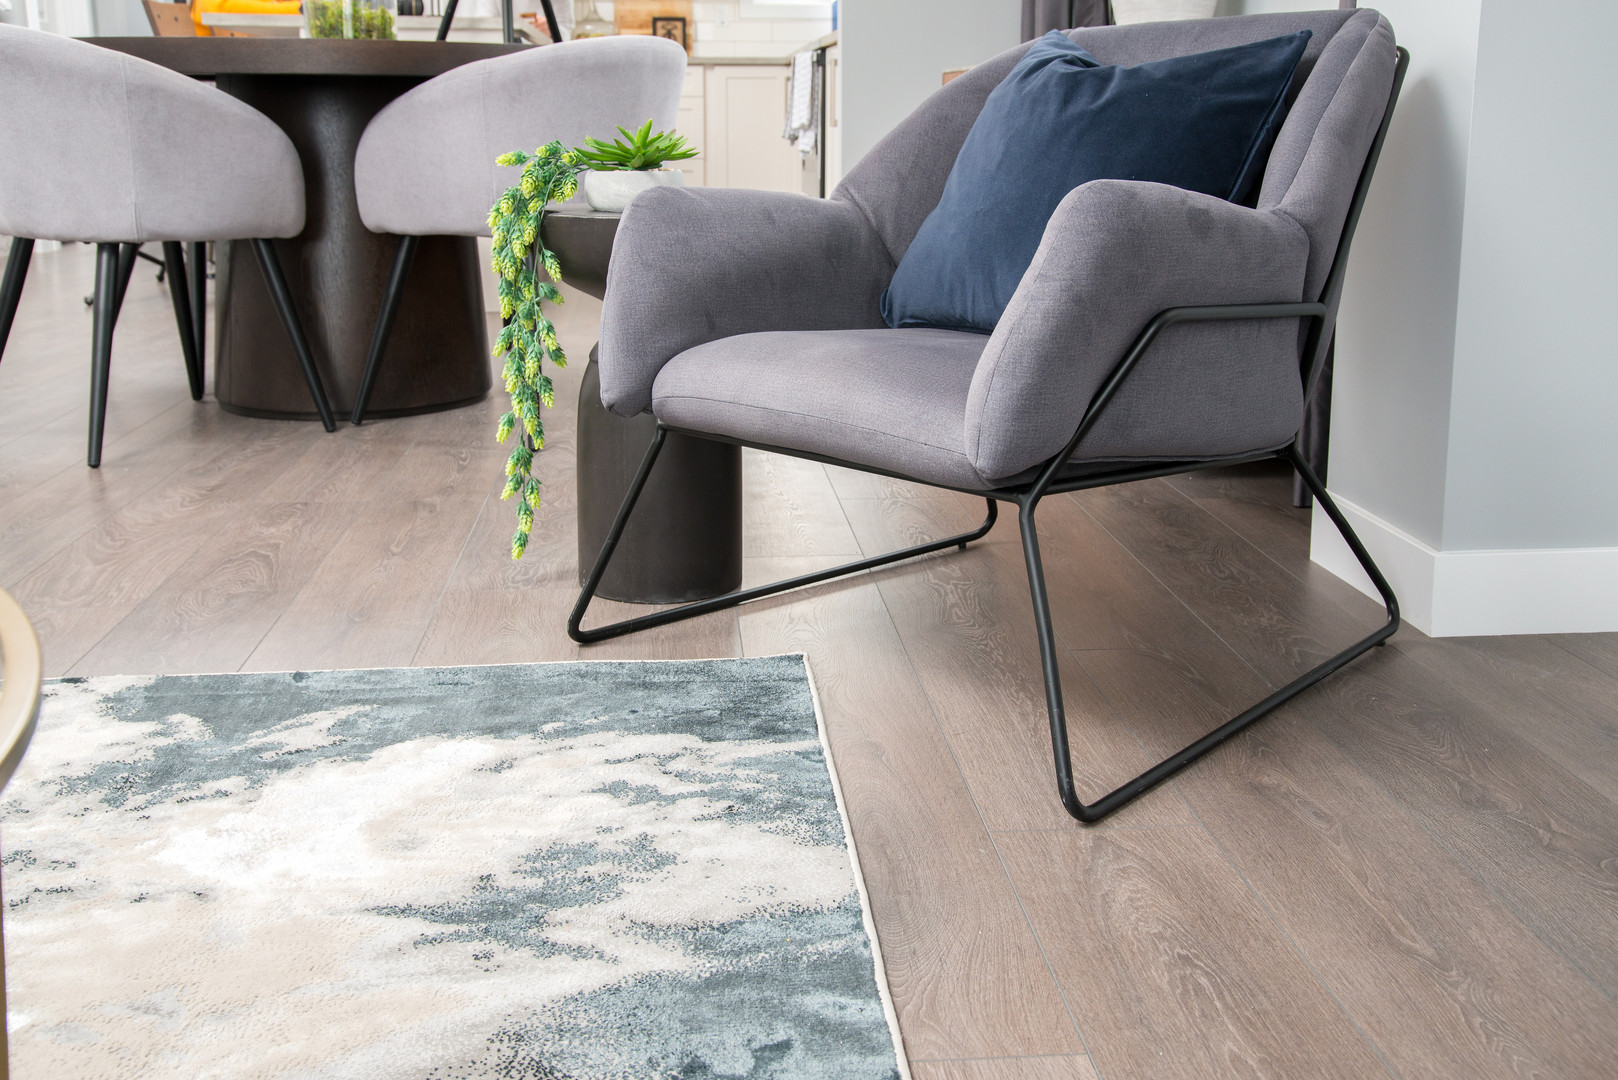 Arm Chair & Living Room Area Rug